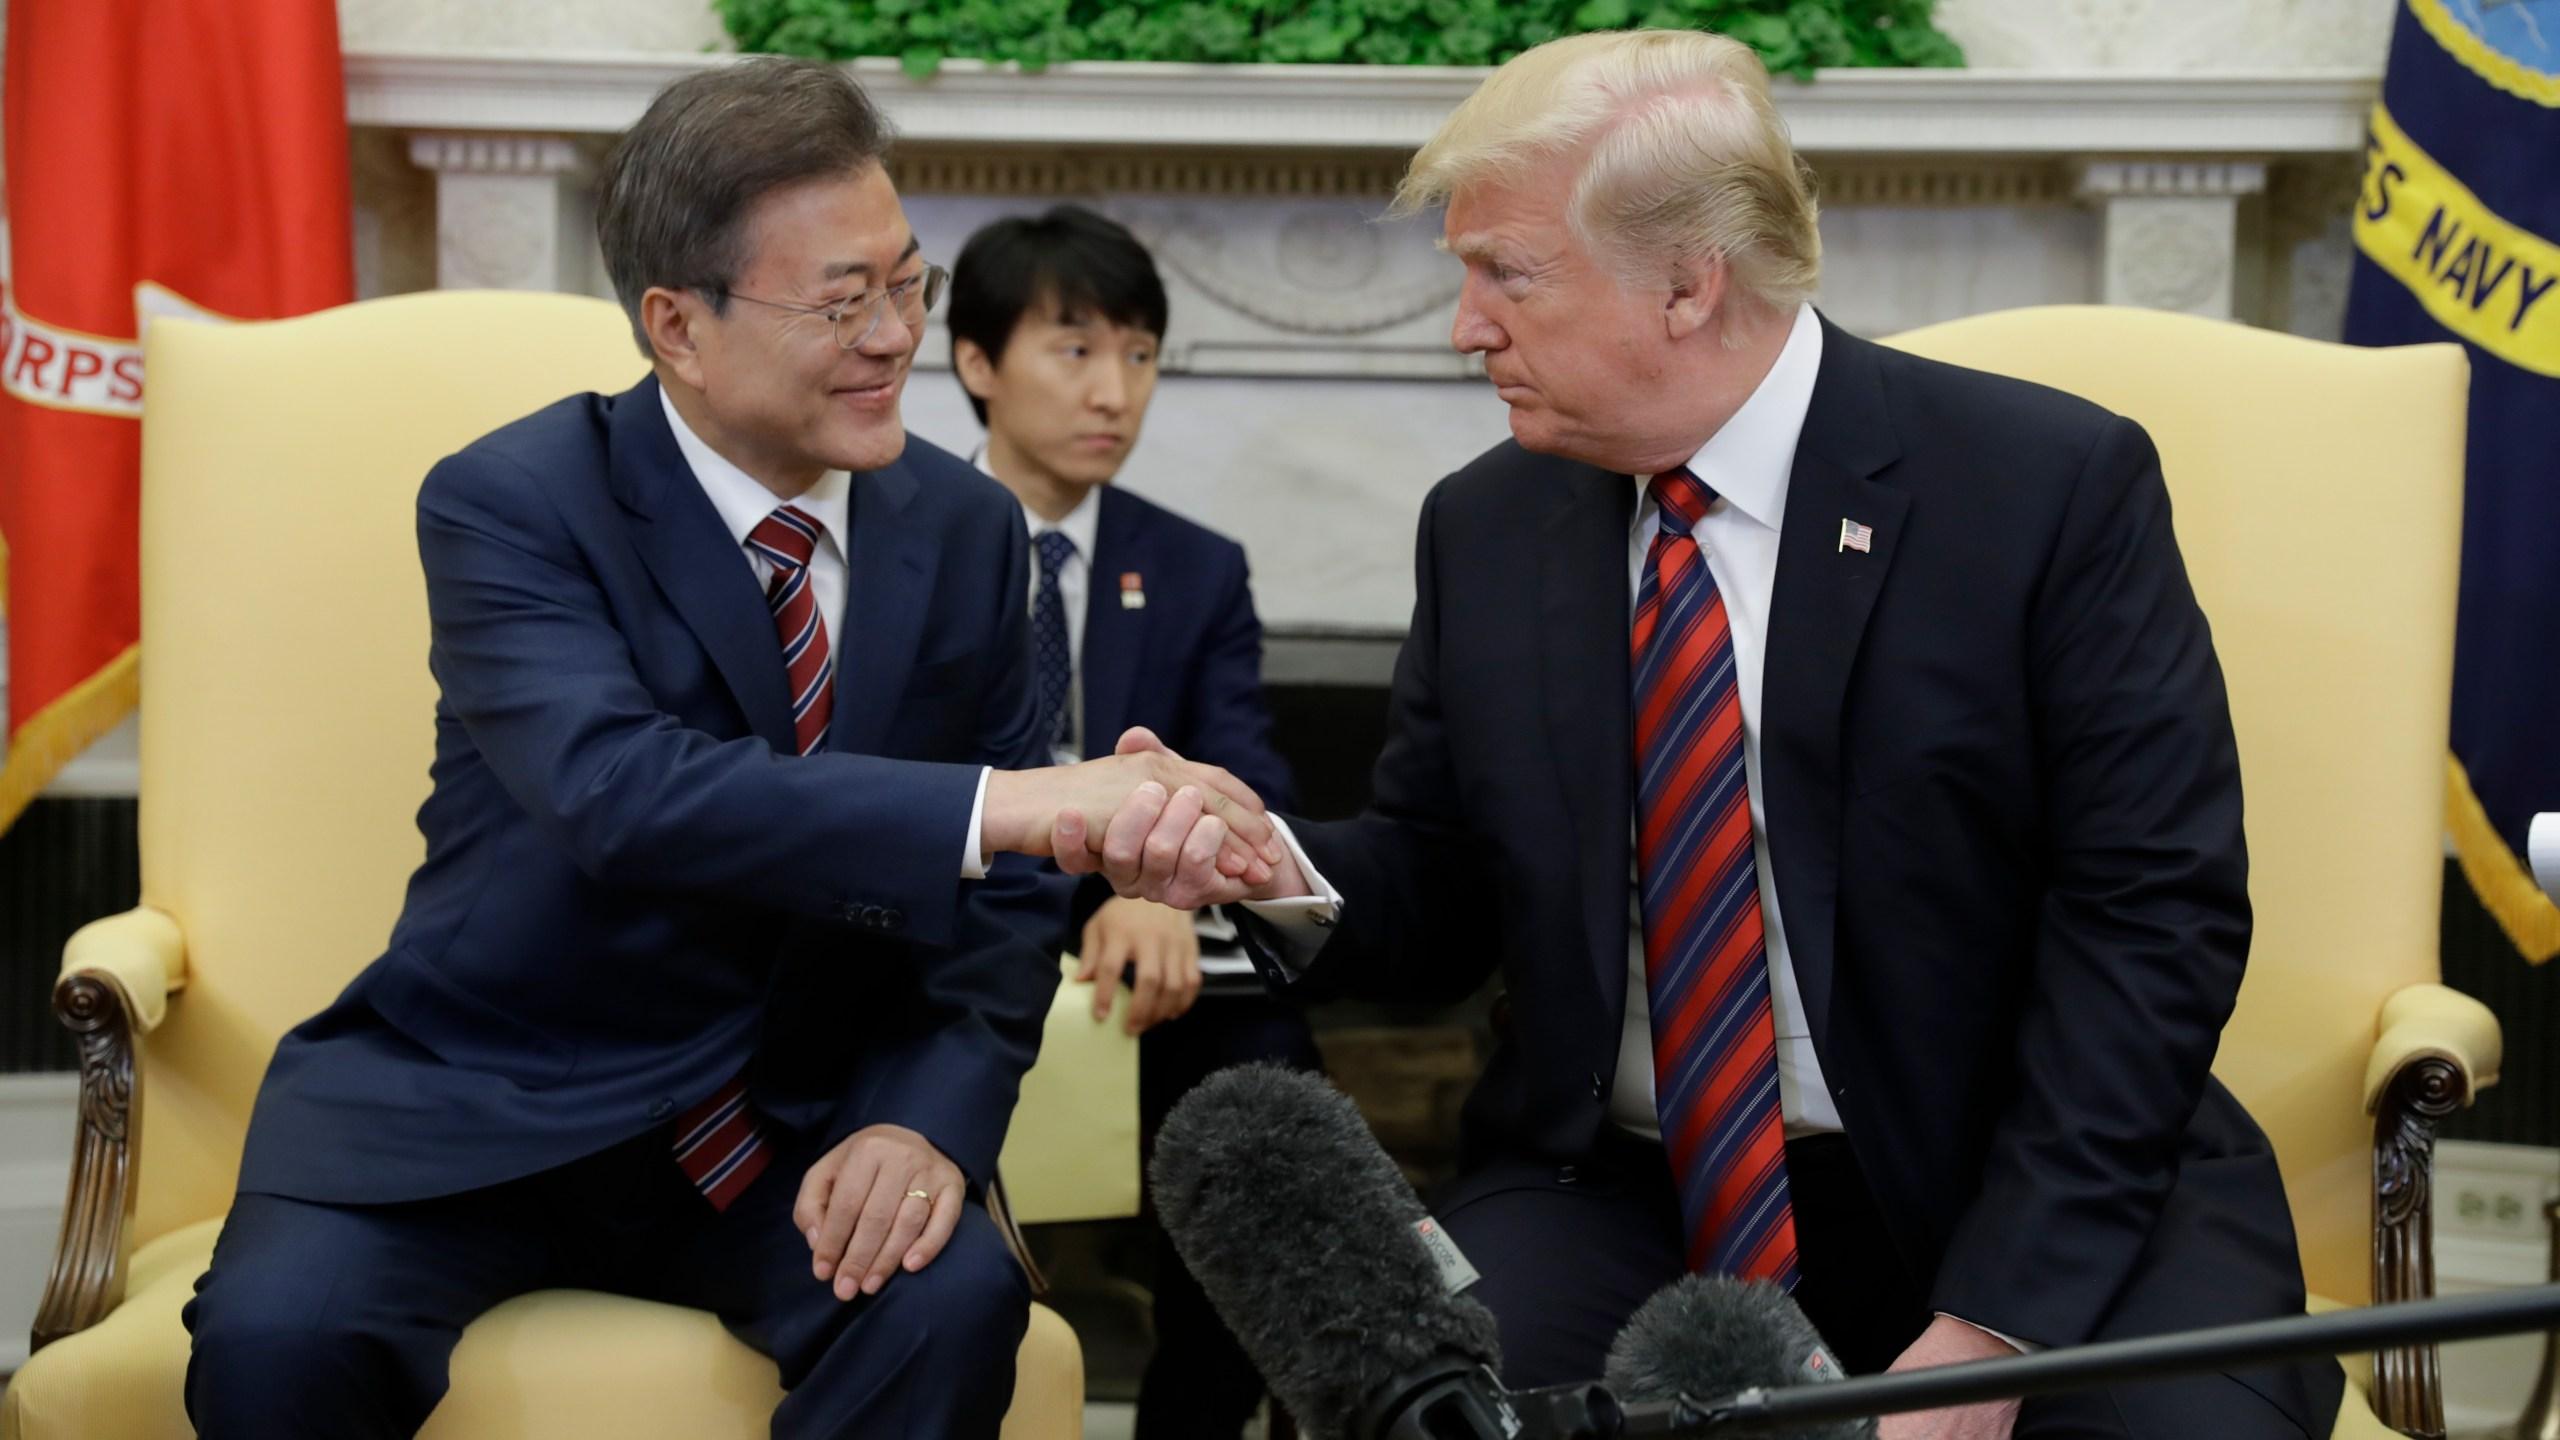 Trump_US_South_Korea_58410-159532.jpg71267993